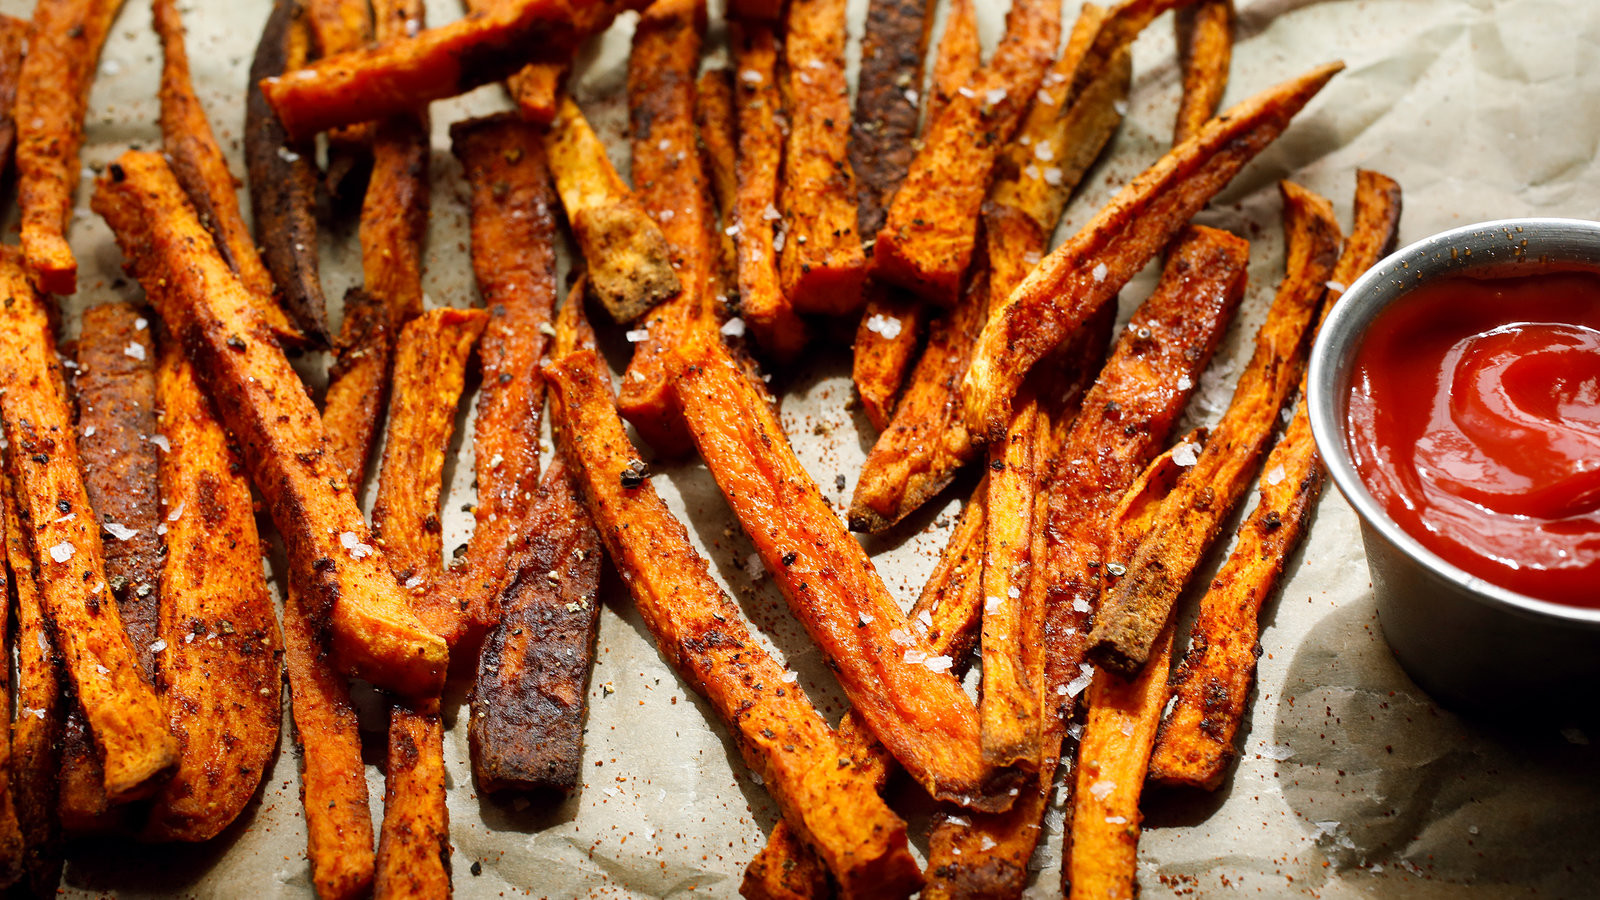 Sweet Potato Fries Recipes  Sweet Potato Fries Recipe NYT Cooking